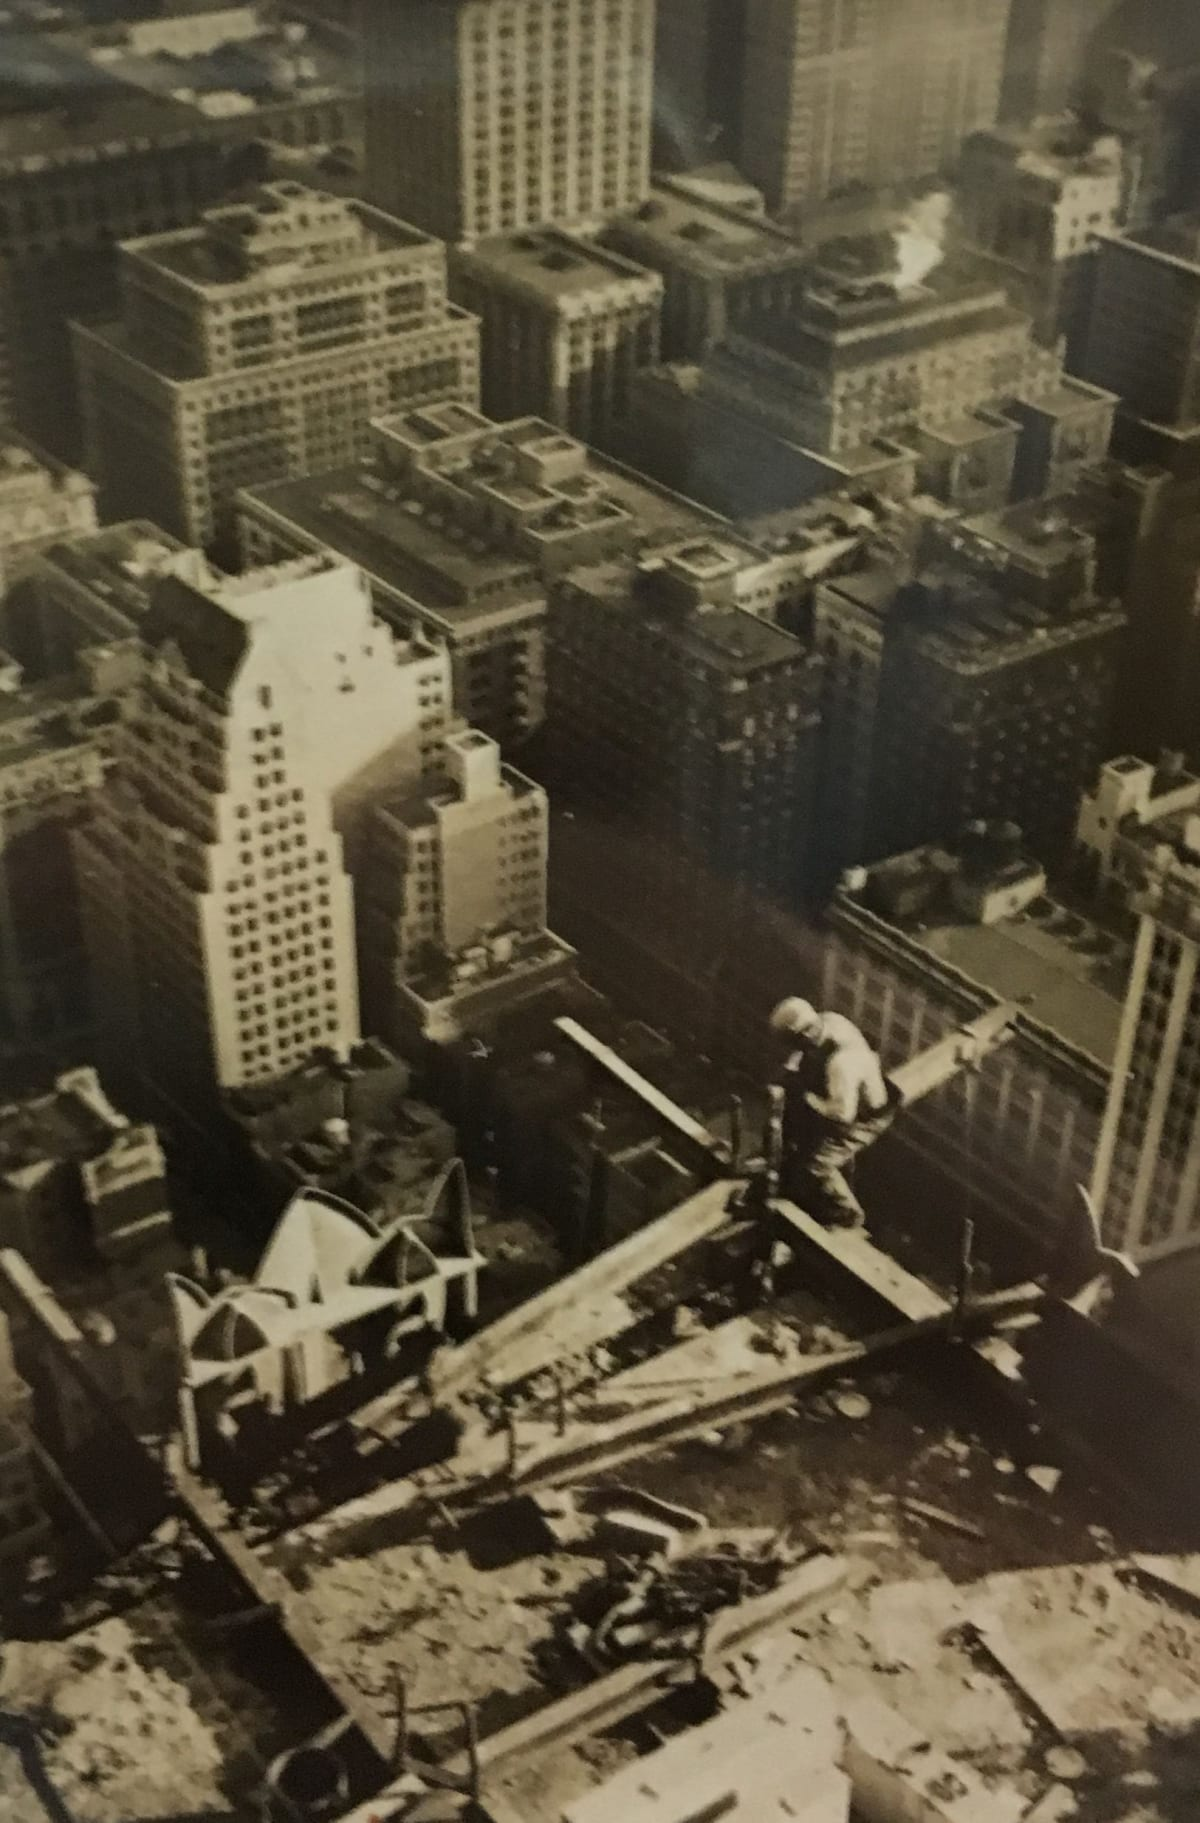 Fred Zinnemann Man on Skyscraper, 1931 Vintage gelatin silver print 3 1/16 x 2 3/16 inches